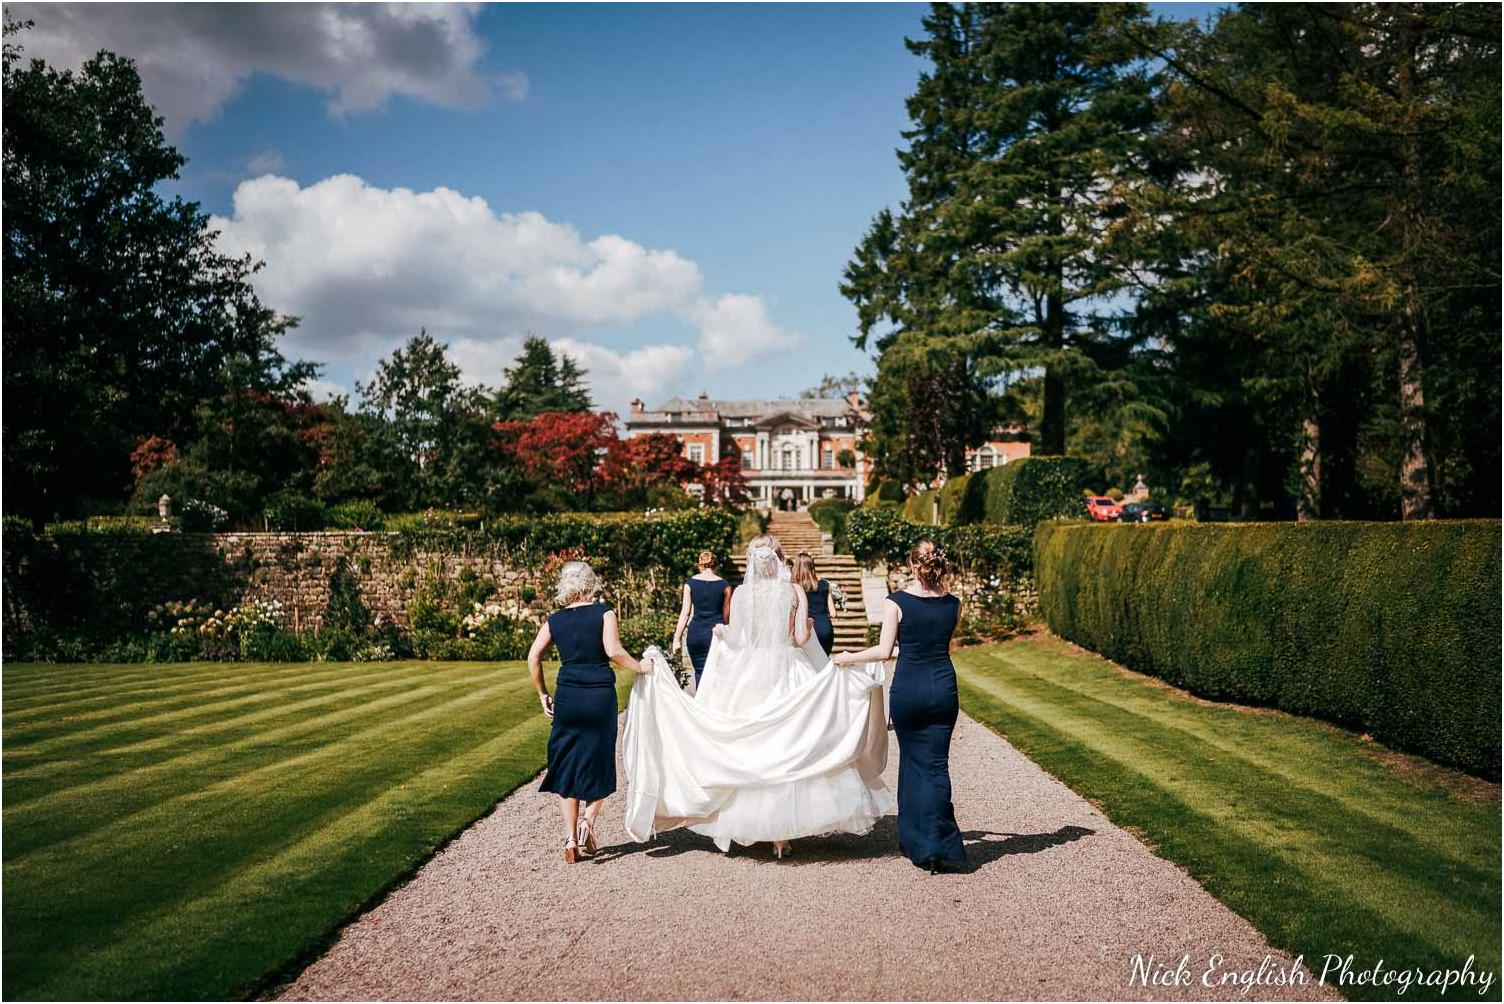 Eaves_Hall_Outdoor_Wedding_Photograph-30.jpg